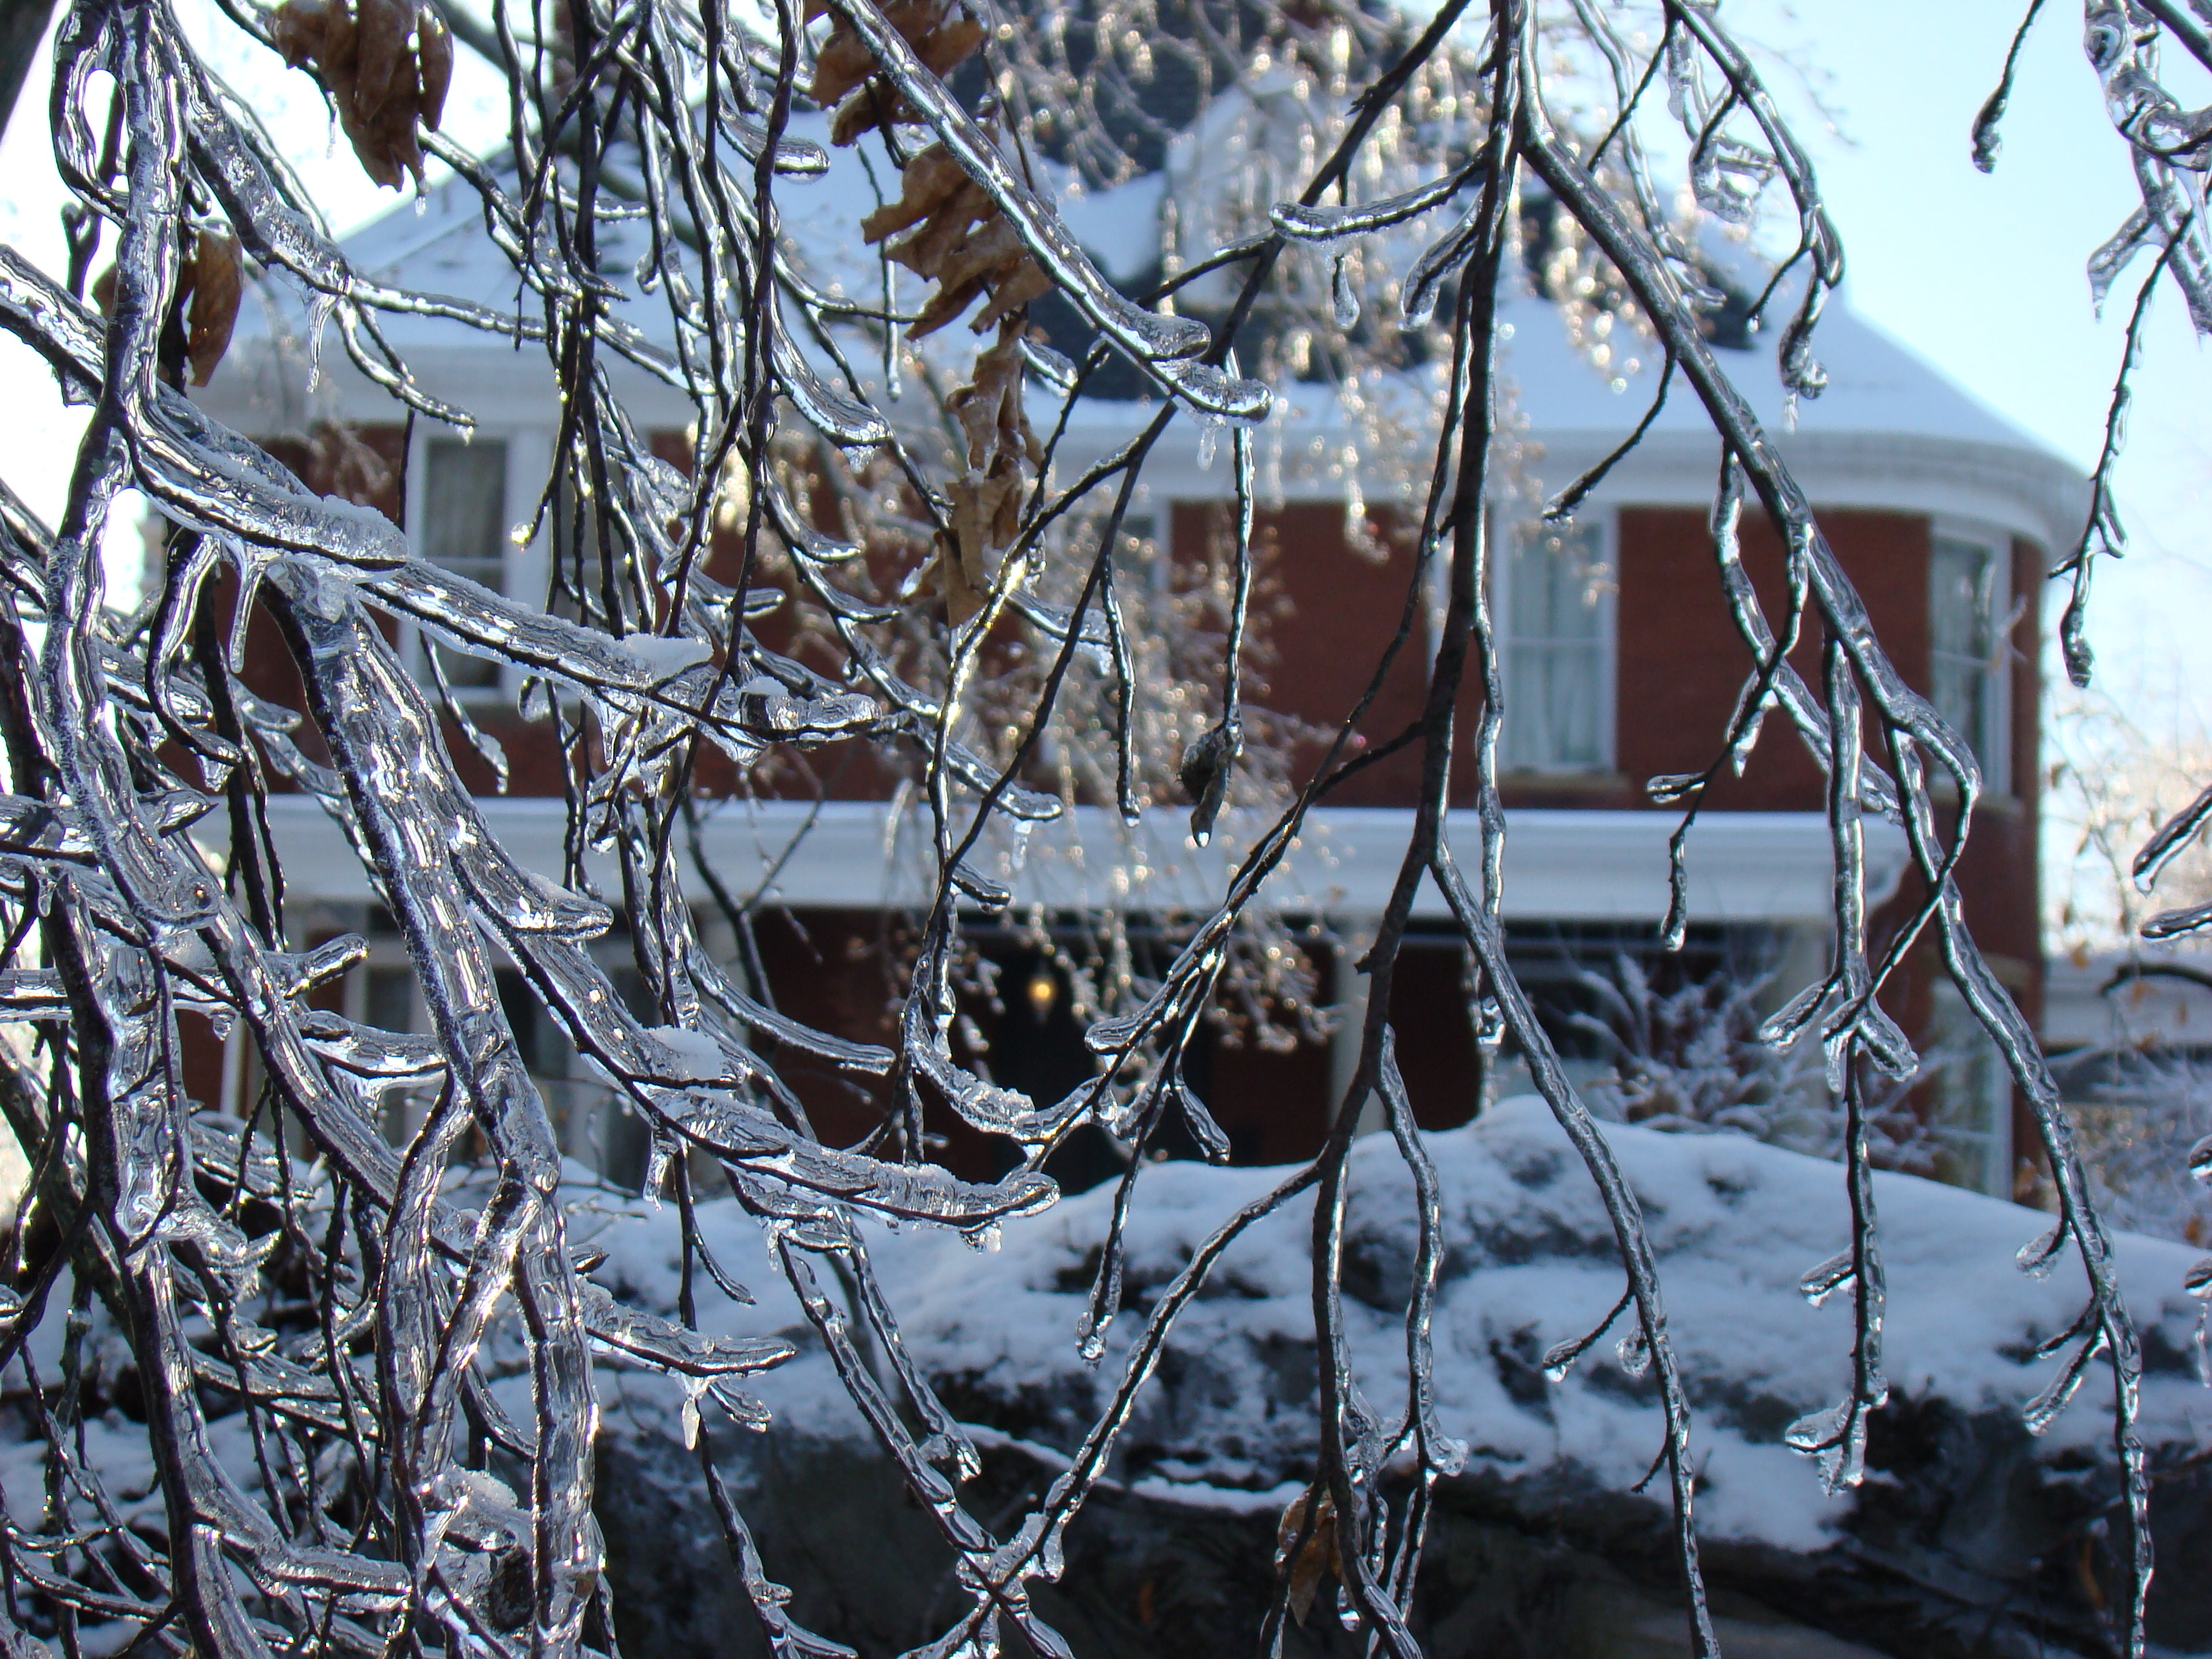 File:Freezing rain, Kentucky 2009 winter storm.JPG - Wikipedia  File:Freezing r...